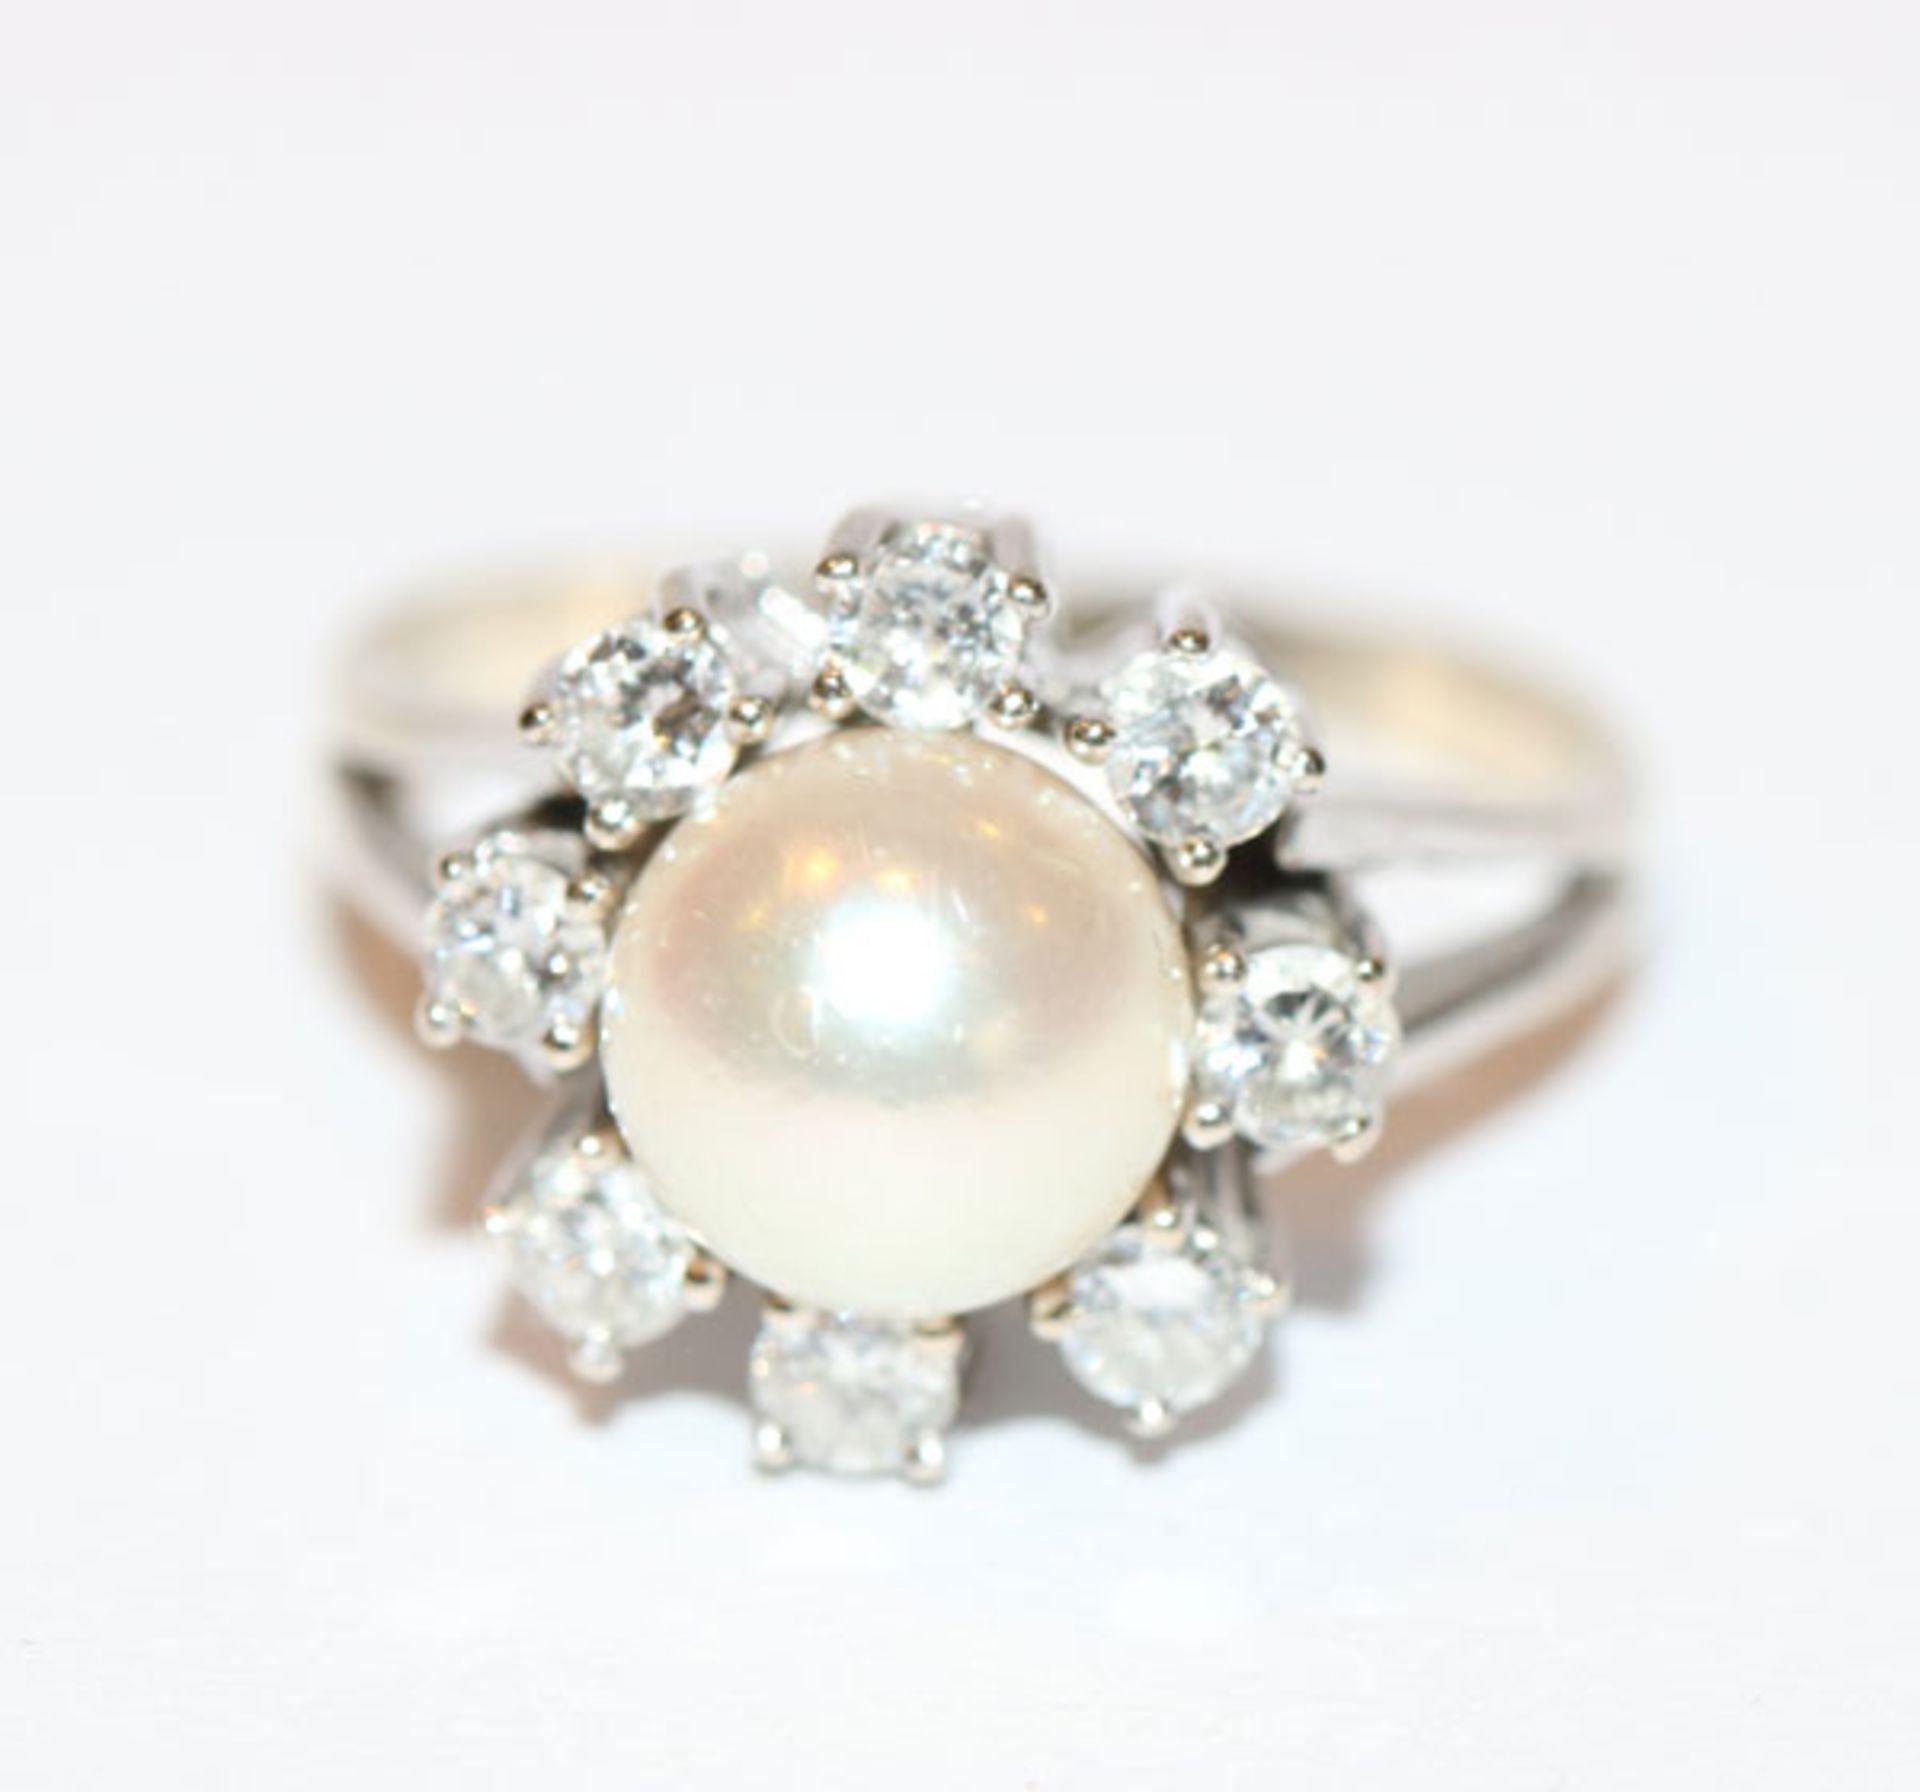 Los 55 - 14 k Weißgold Perlenring mit 8 Diamanten, zus. ca. 0,60 ct., Gr. 53, klassische Handarbeit